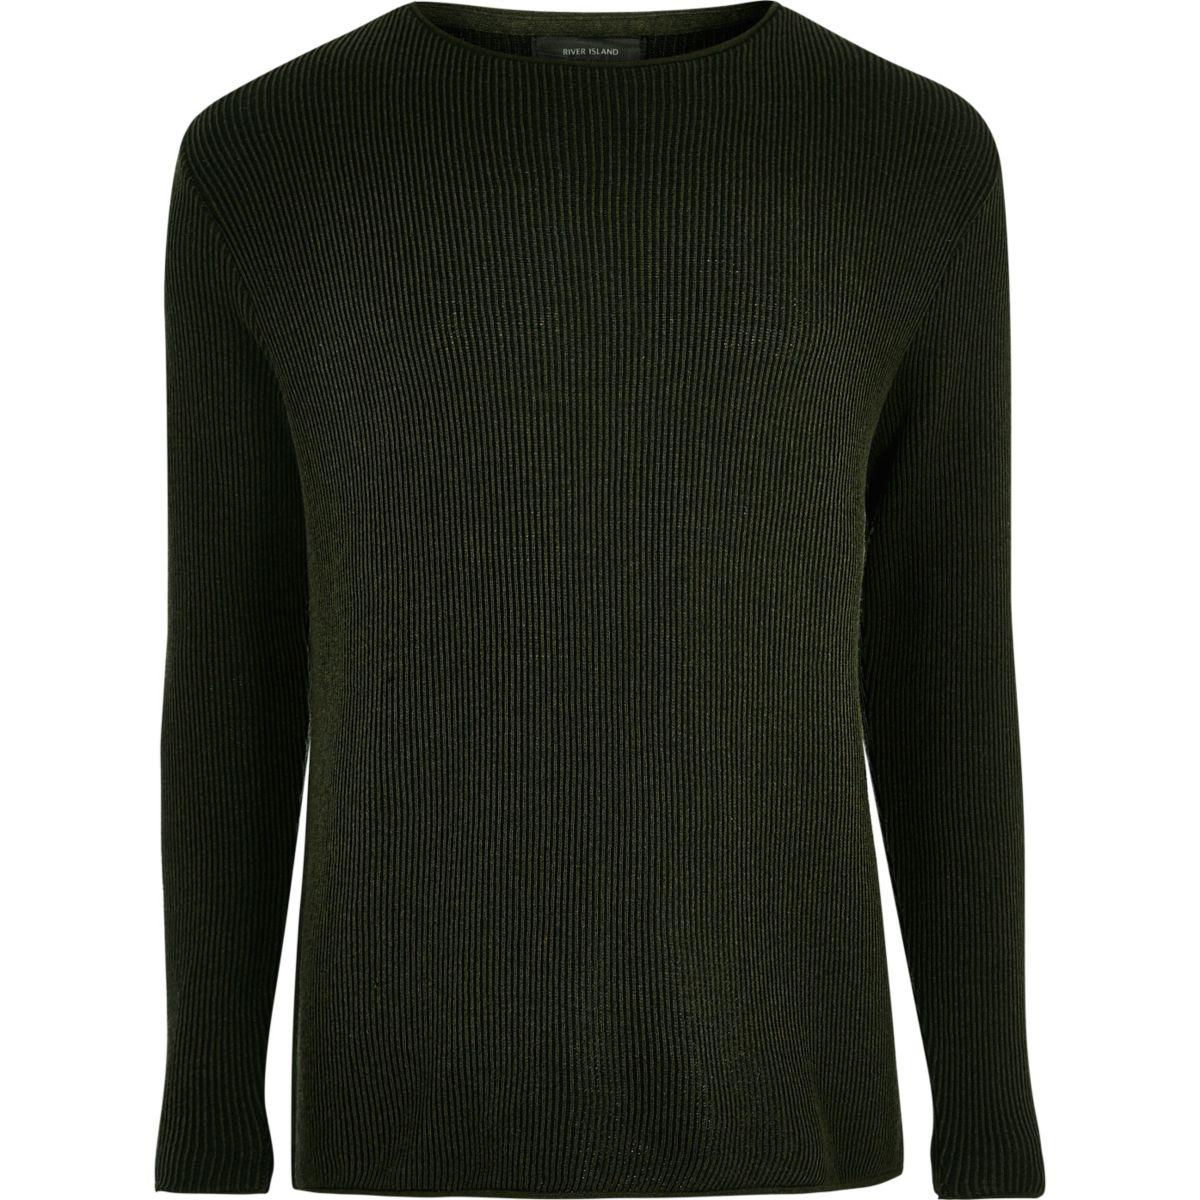 Khaki green textured sweater